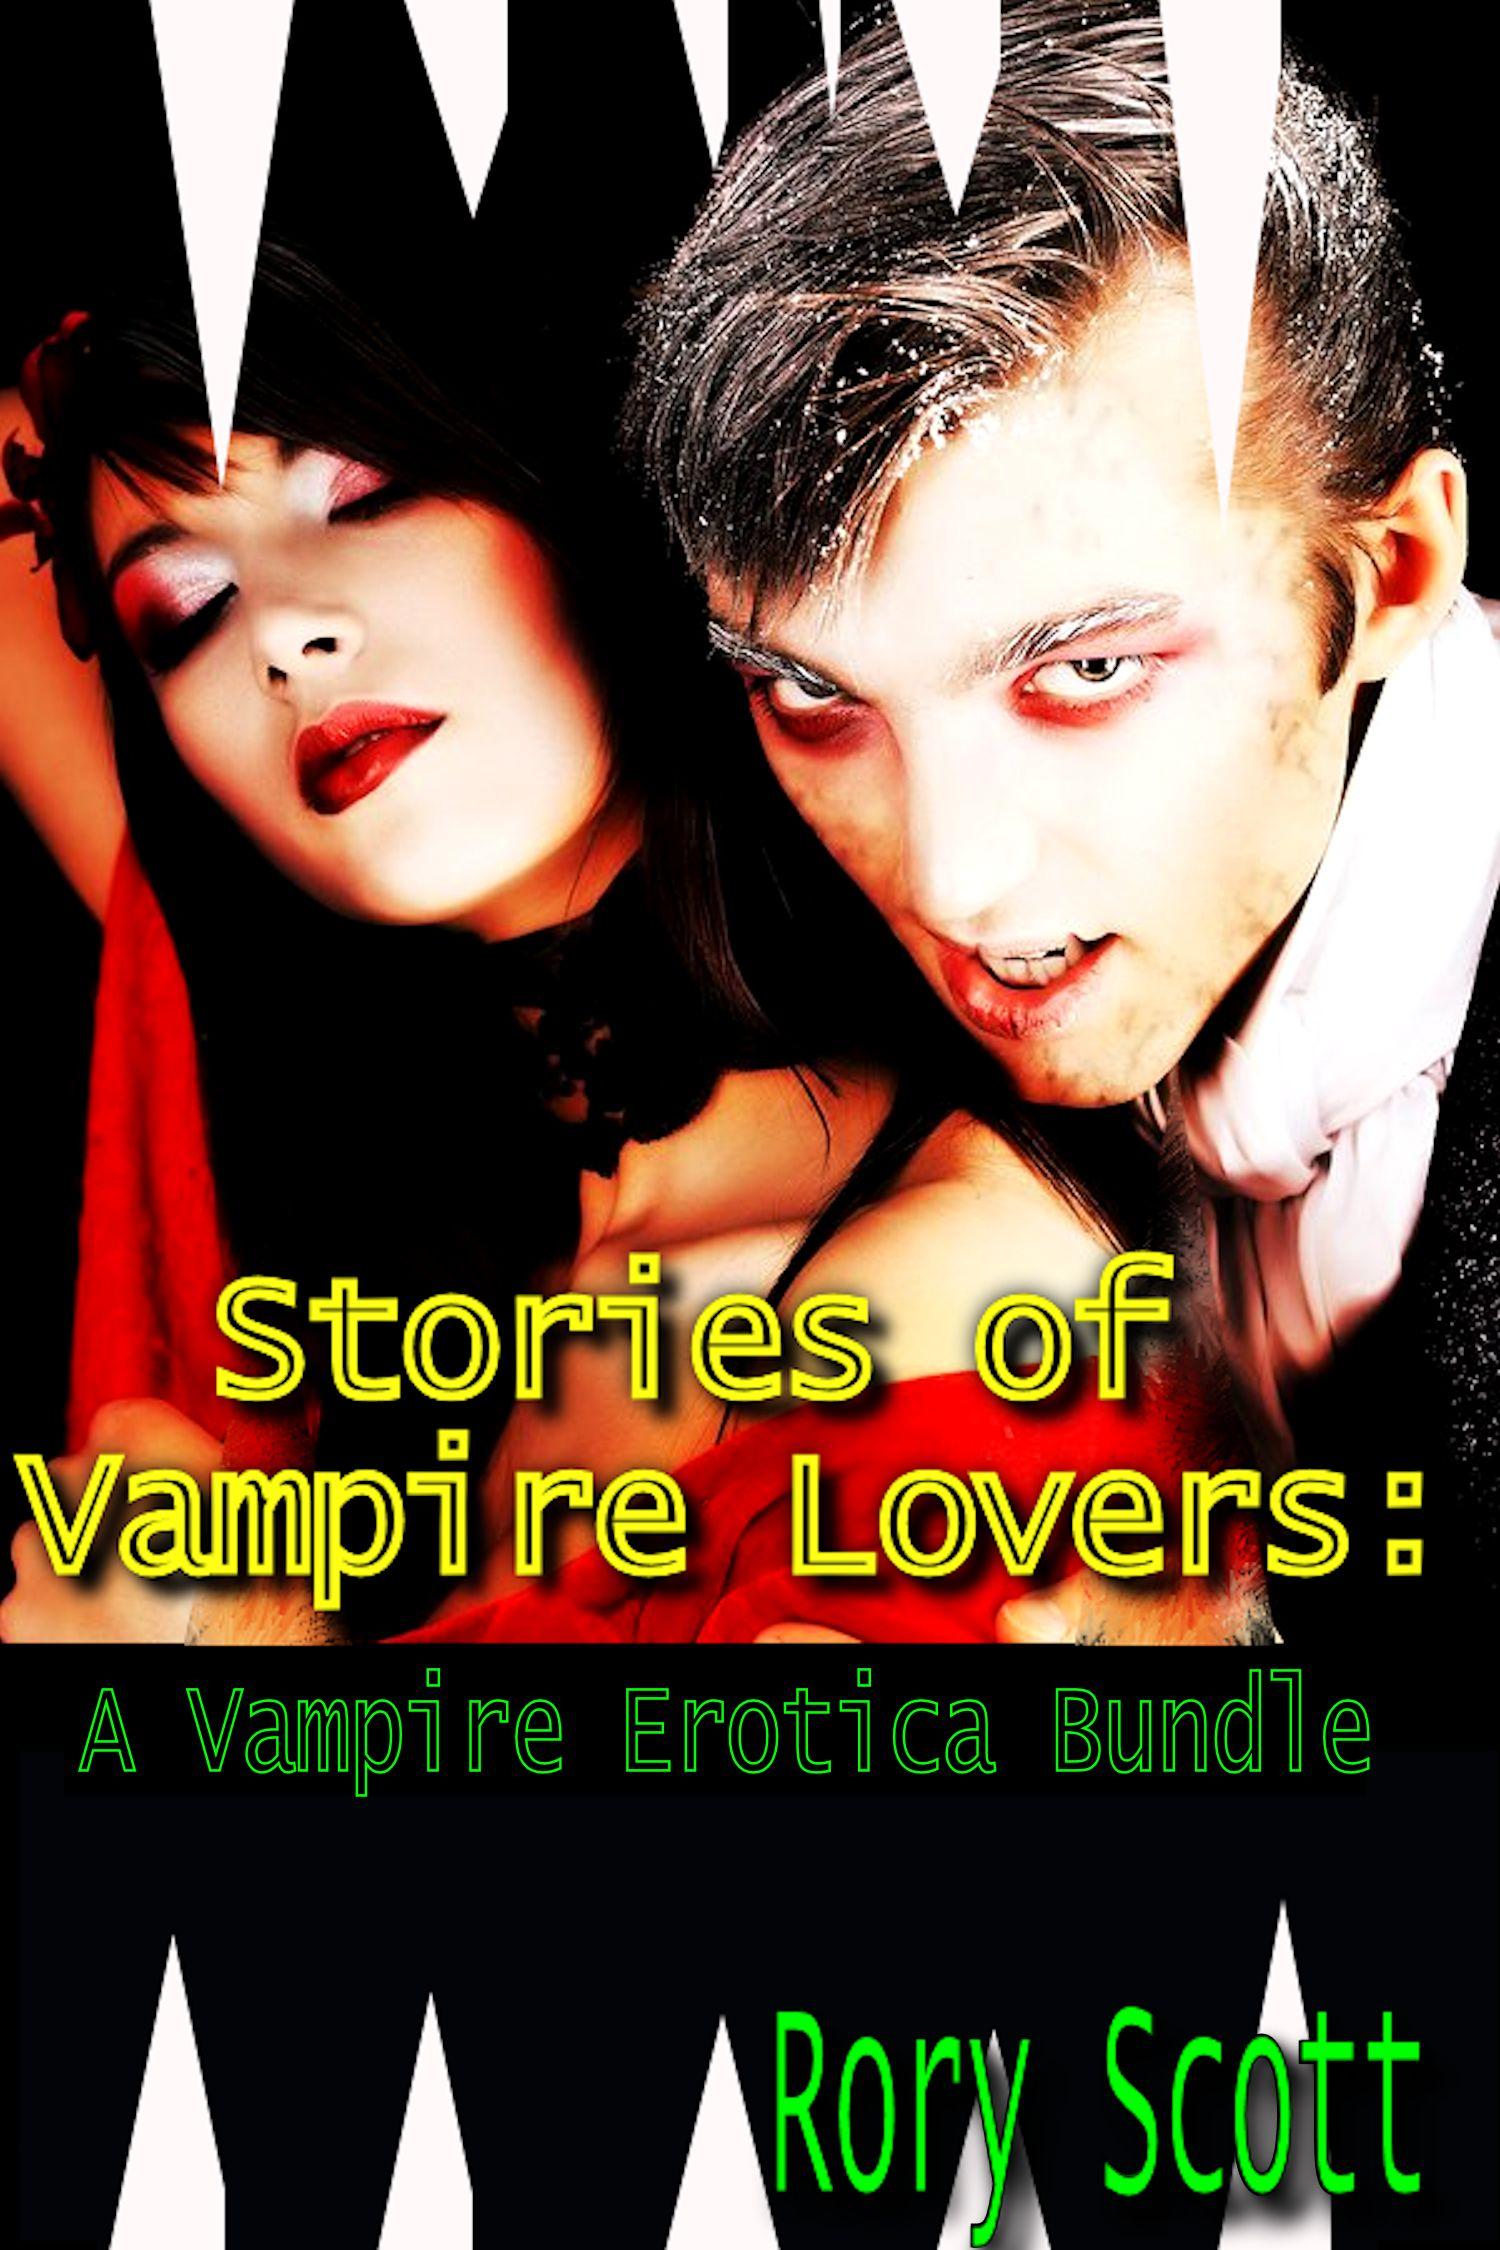 Vampire erotica stories naked videos